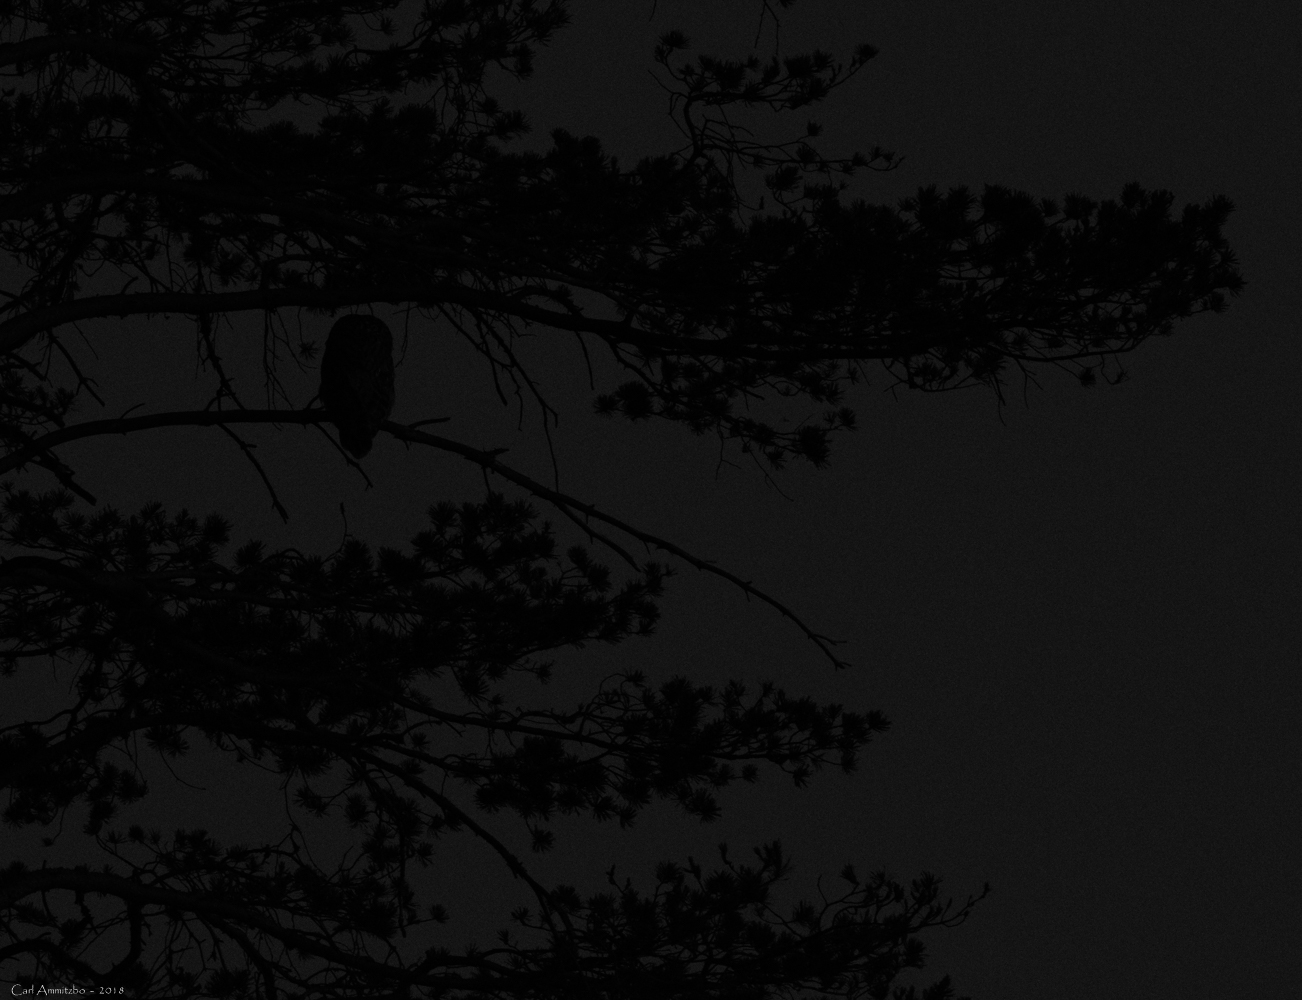 08 - 0608 - Slagugle - 01 - Bergslagen